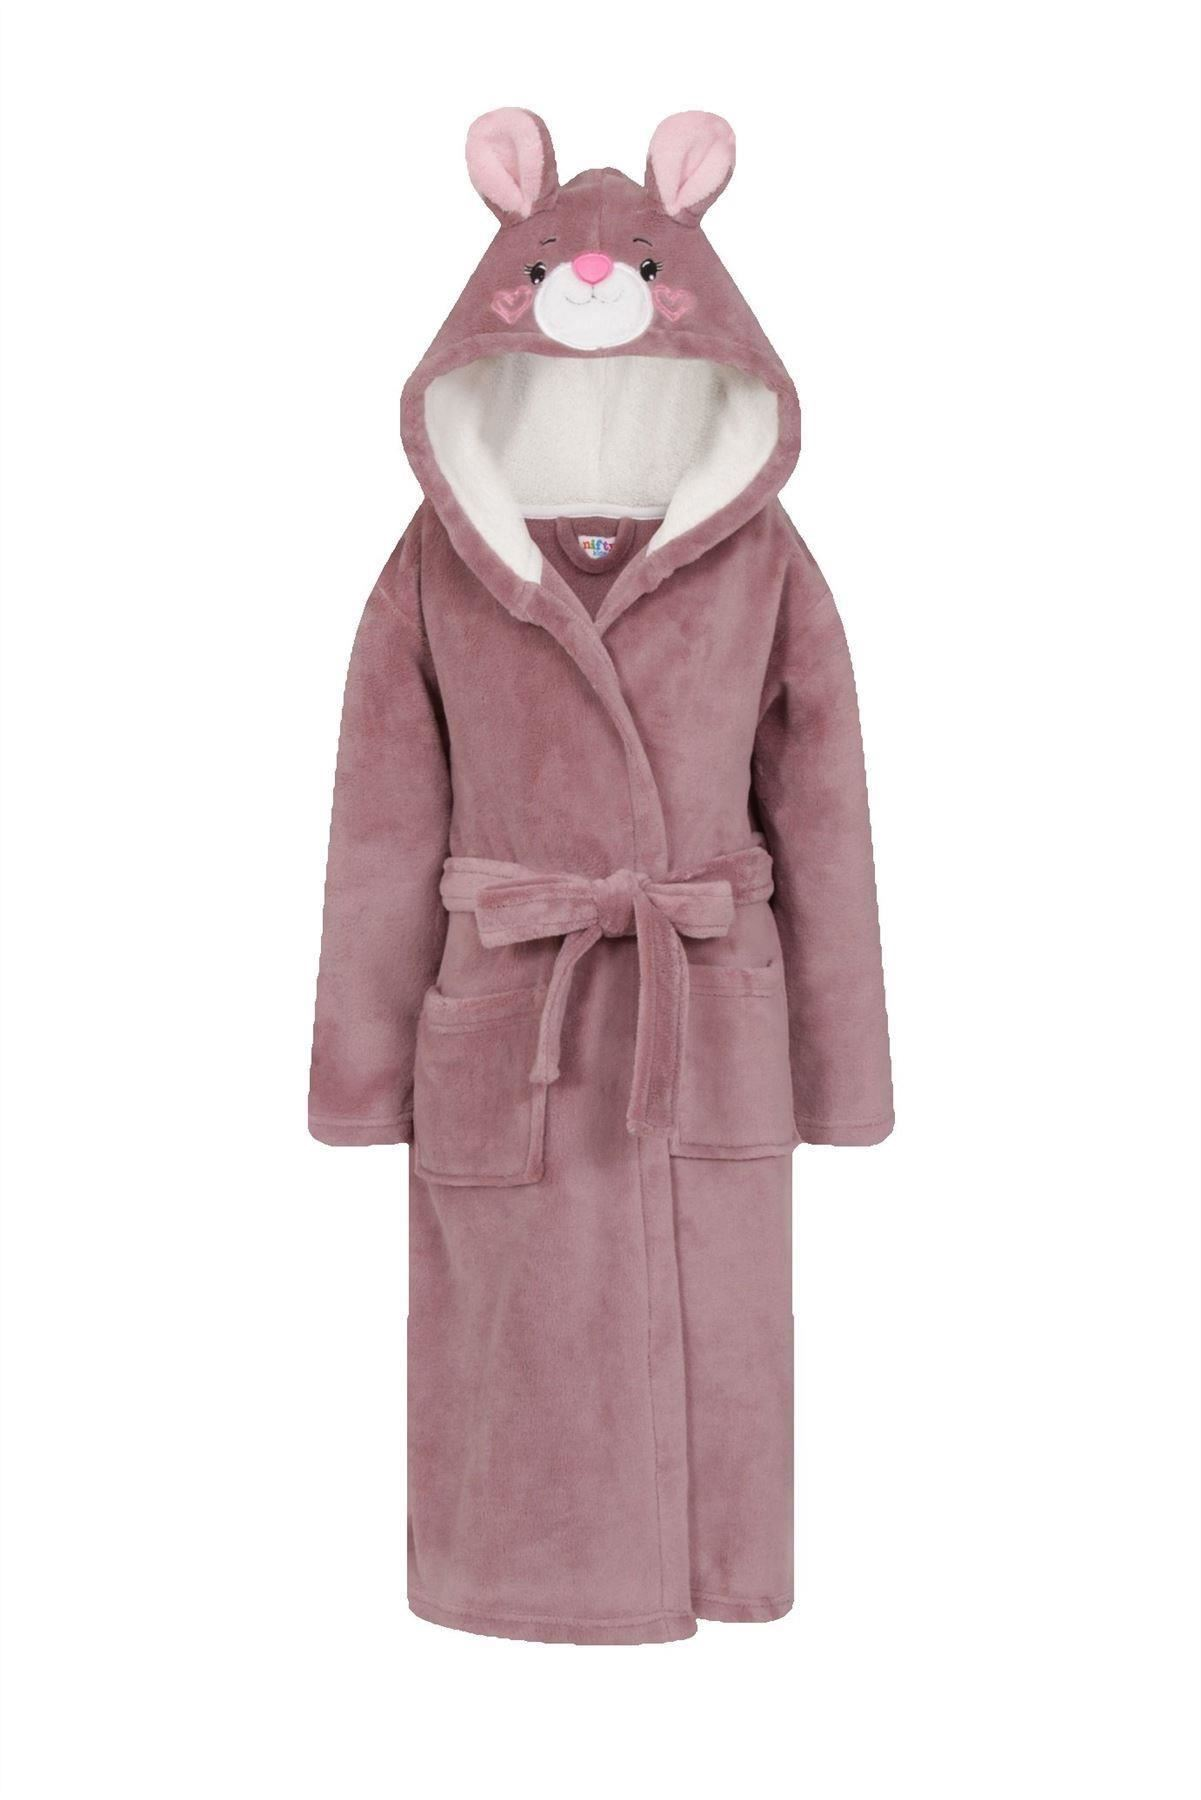 girls-night-gown-bathrobe-cute-mouse-age-3-4-5-6-7-8-9-10